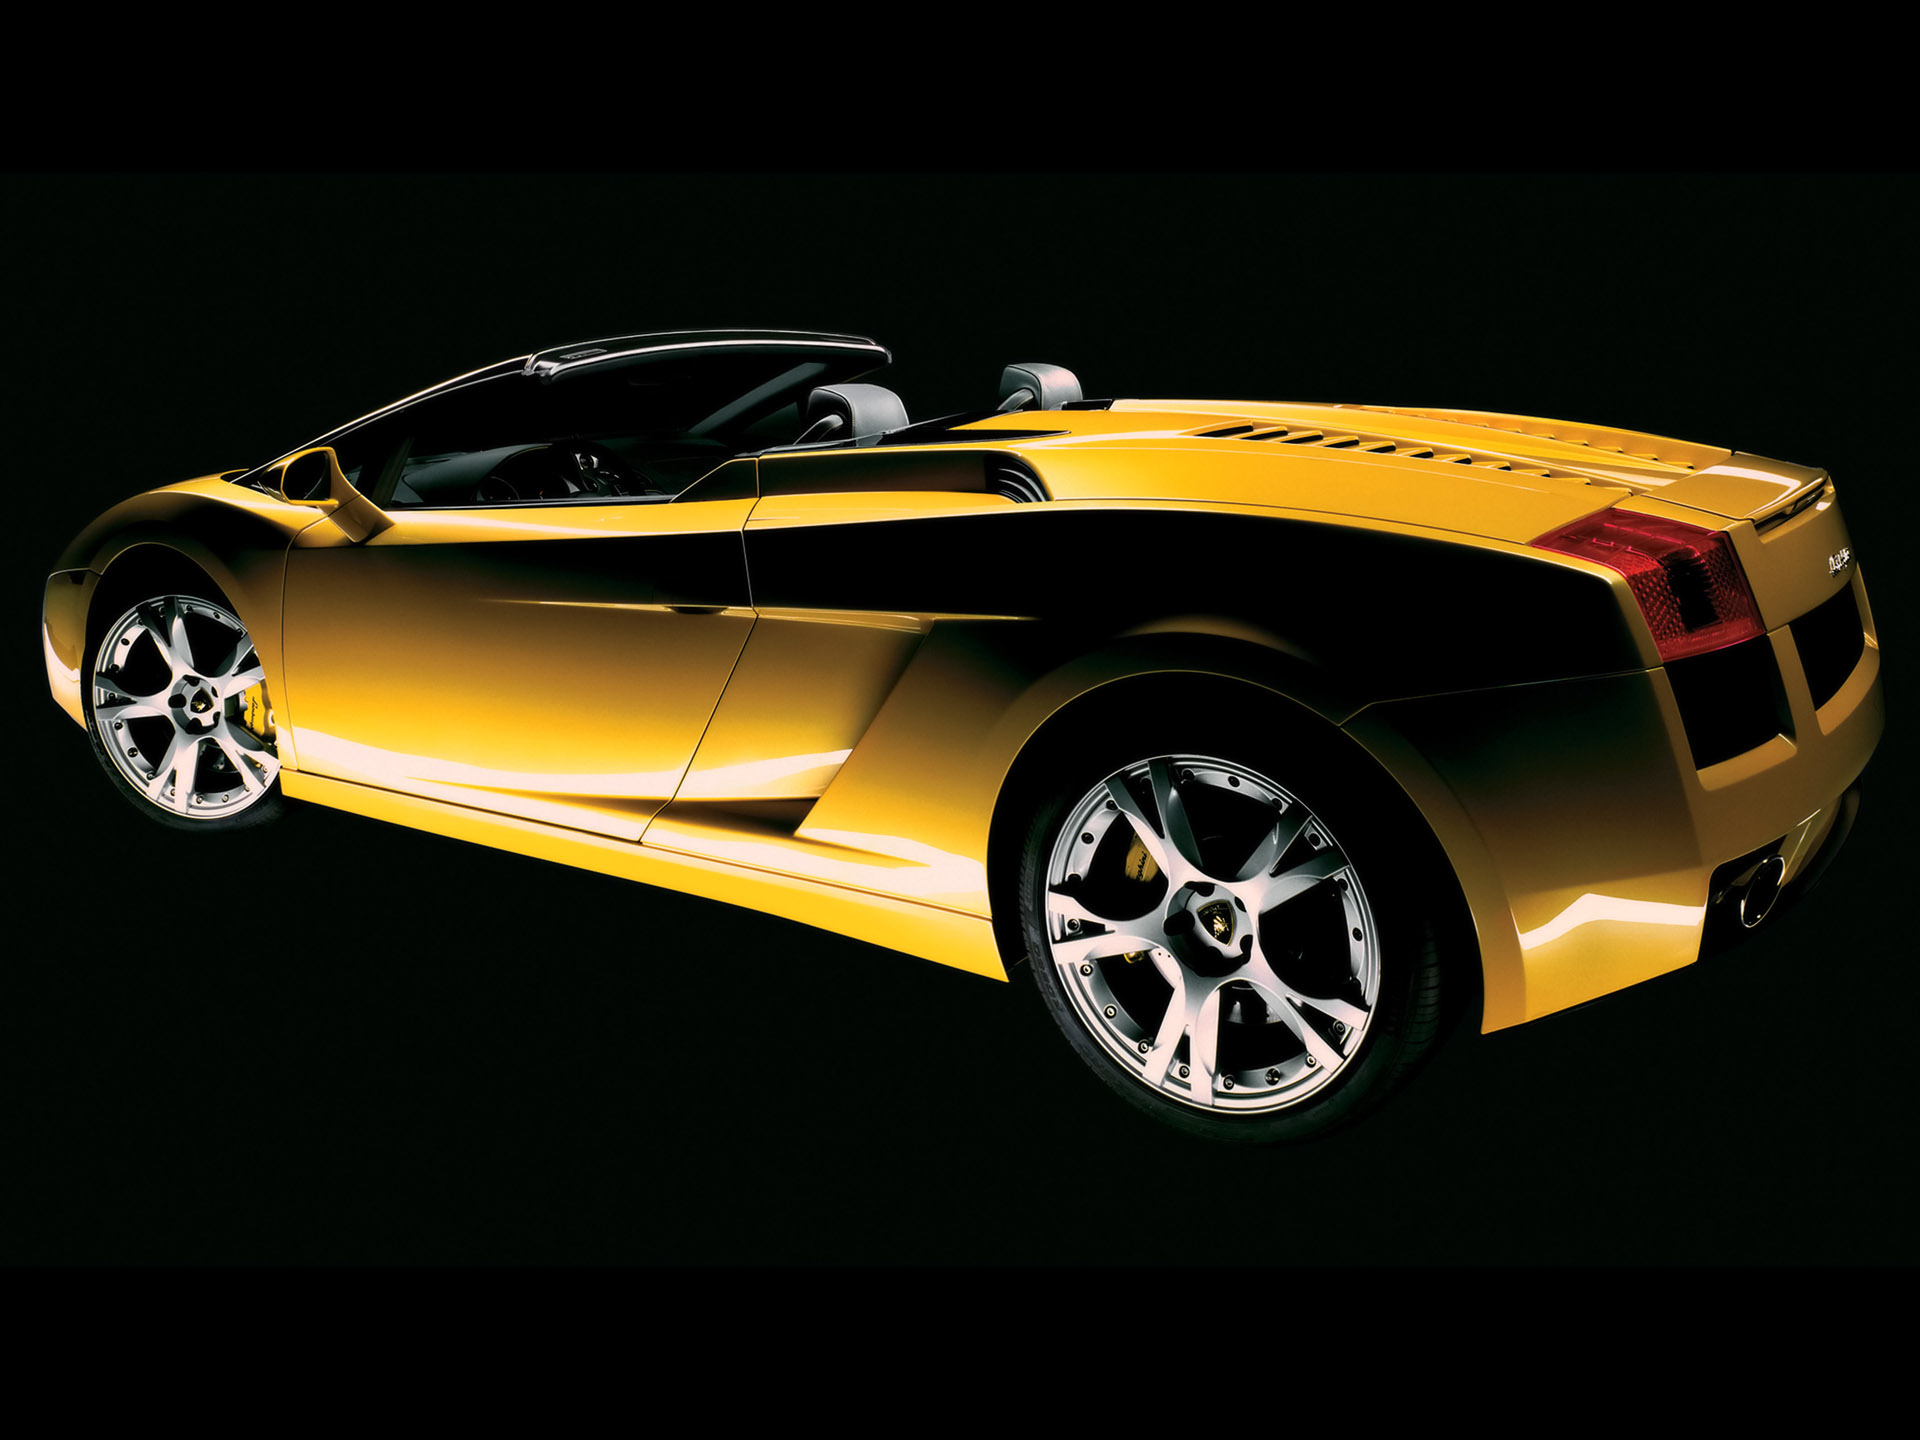 2006 Lamborghini Gallardo Spyder   Yellow   Rear Angle   Top Down 1920x1440